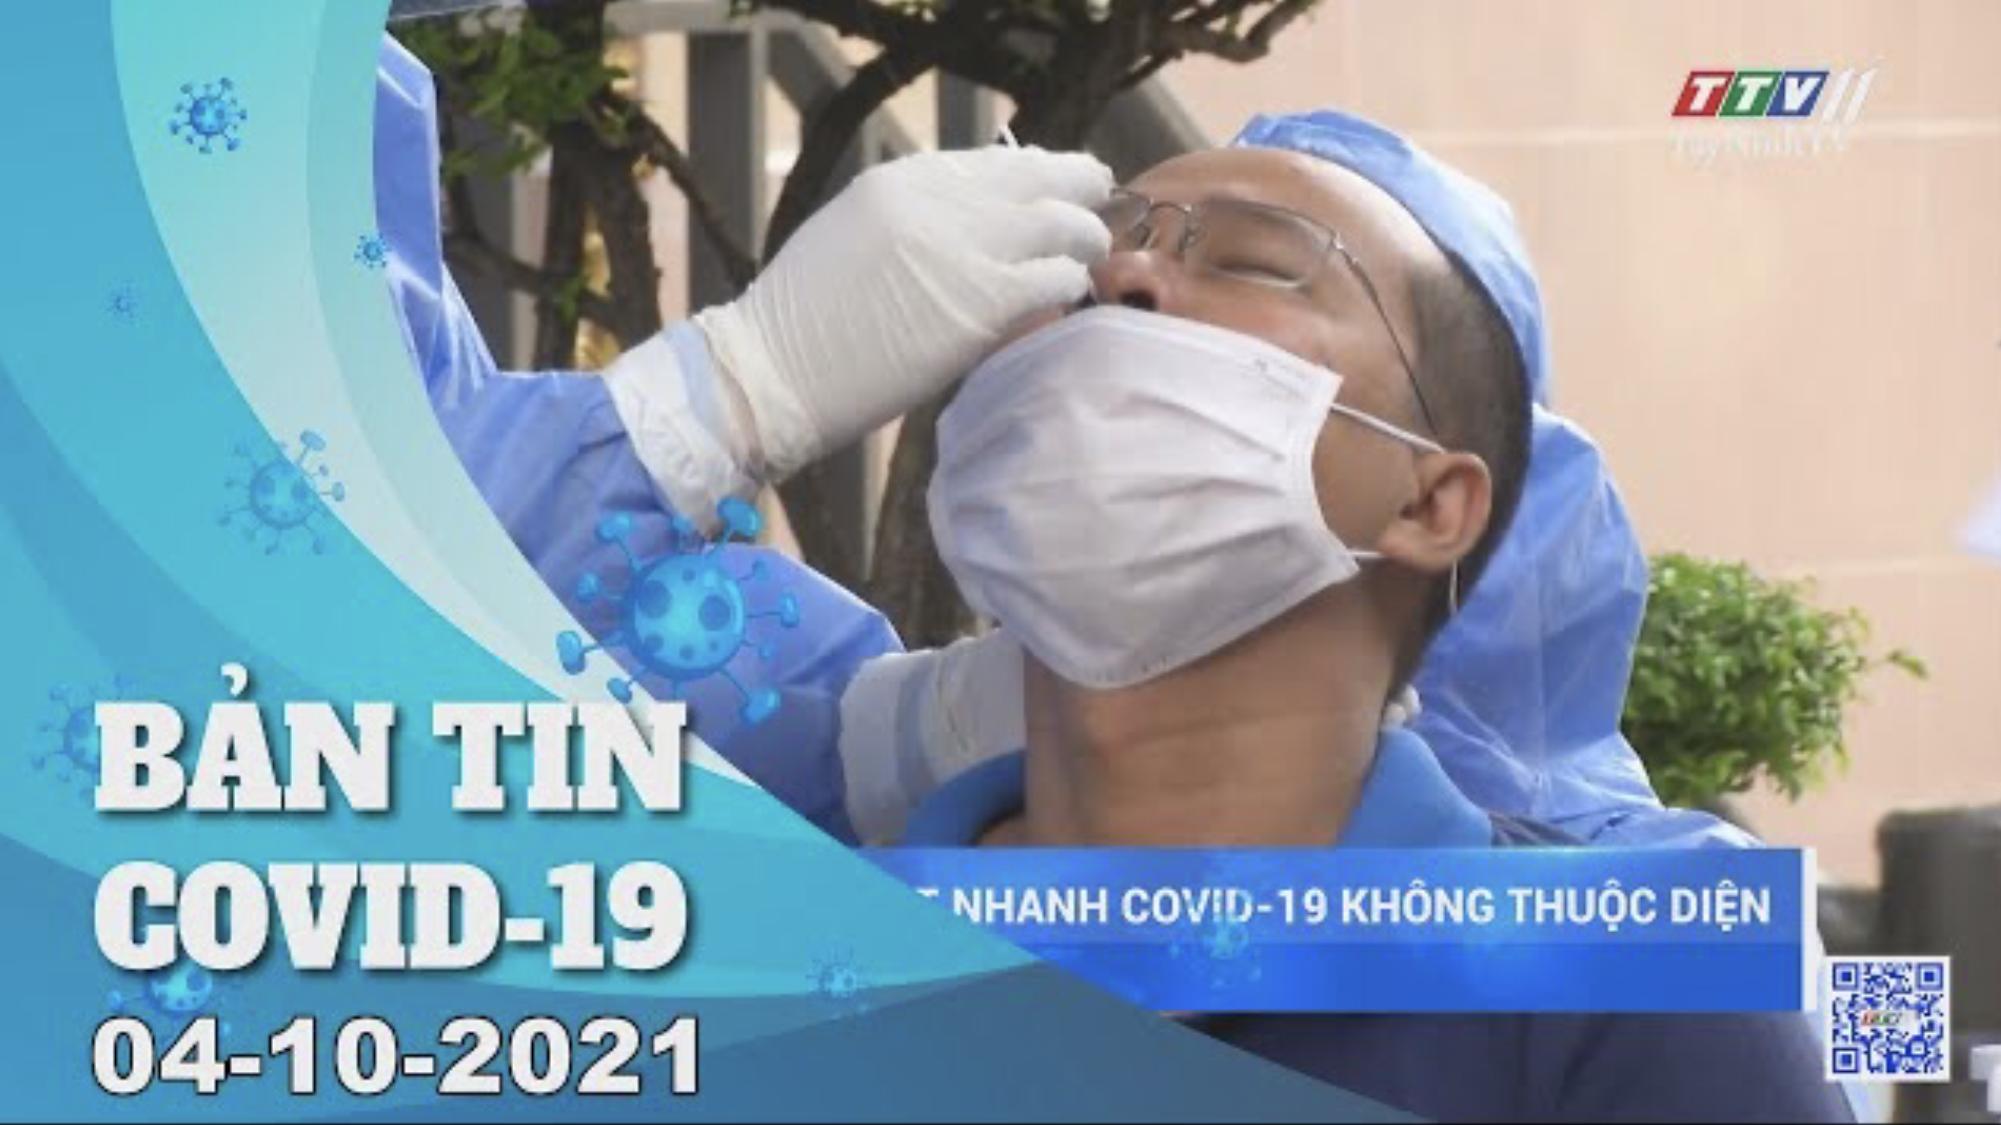 BẢN TIN COVID-19 04/10/2021 | Tin tức hôm nay | TayNinhTV